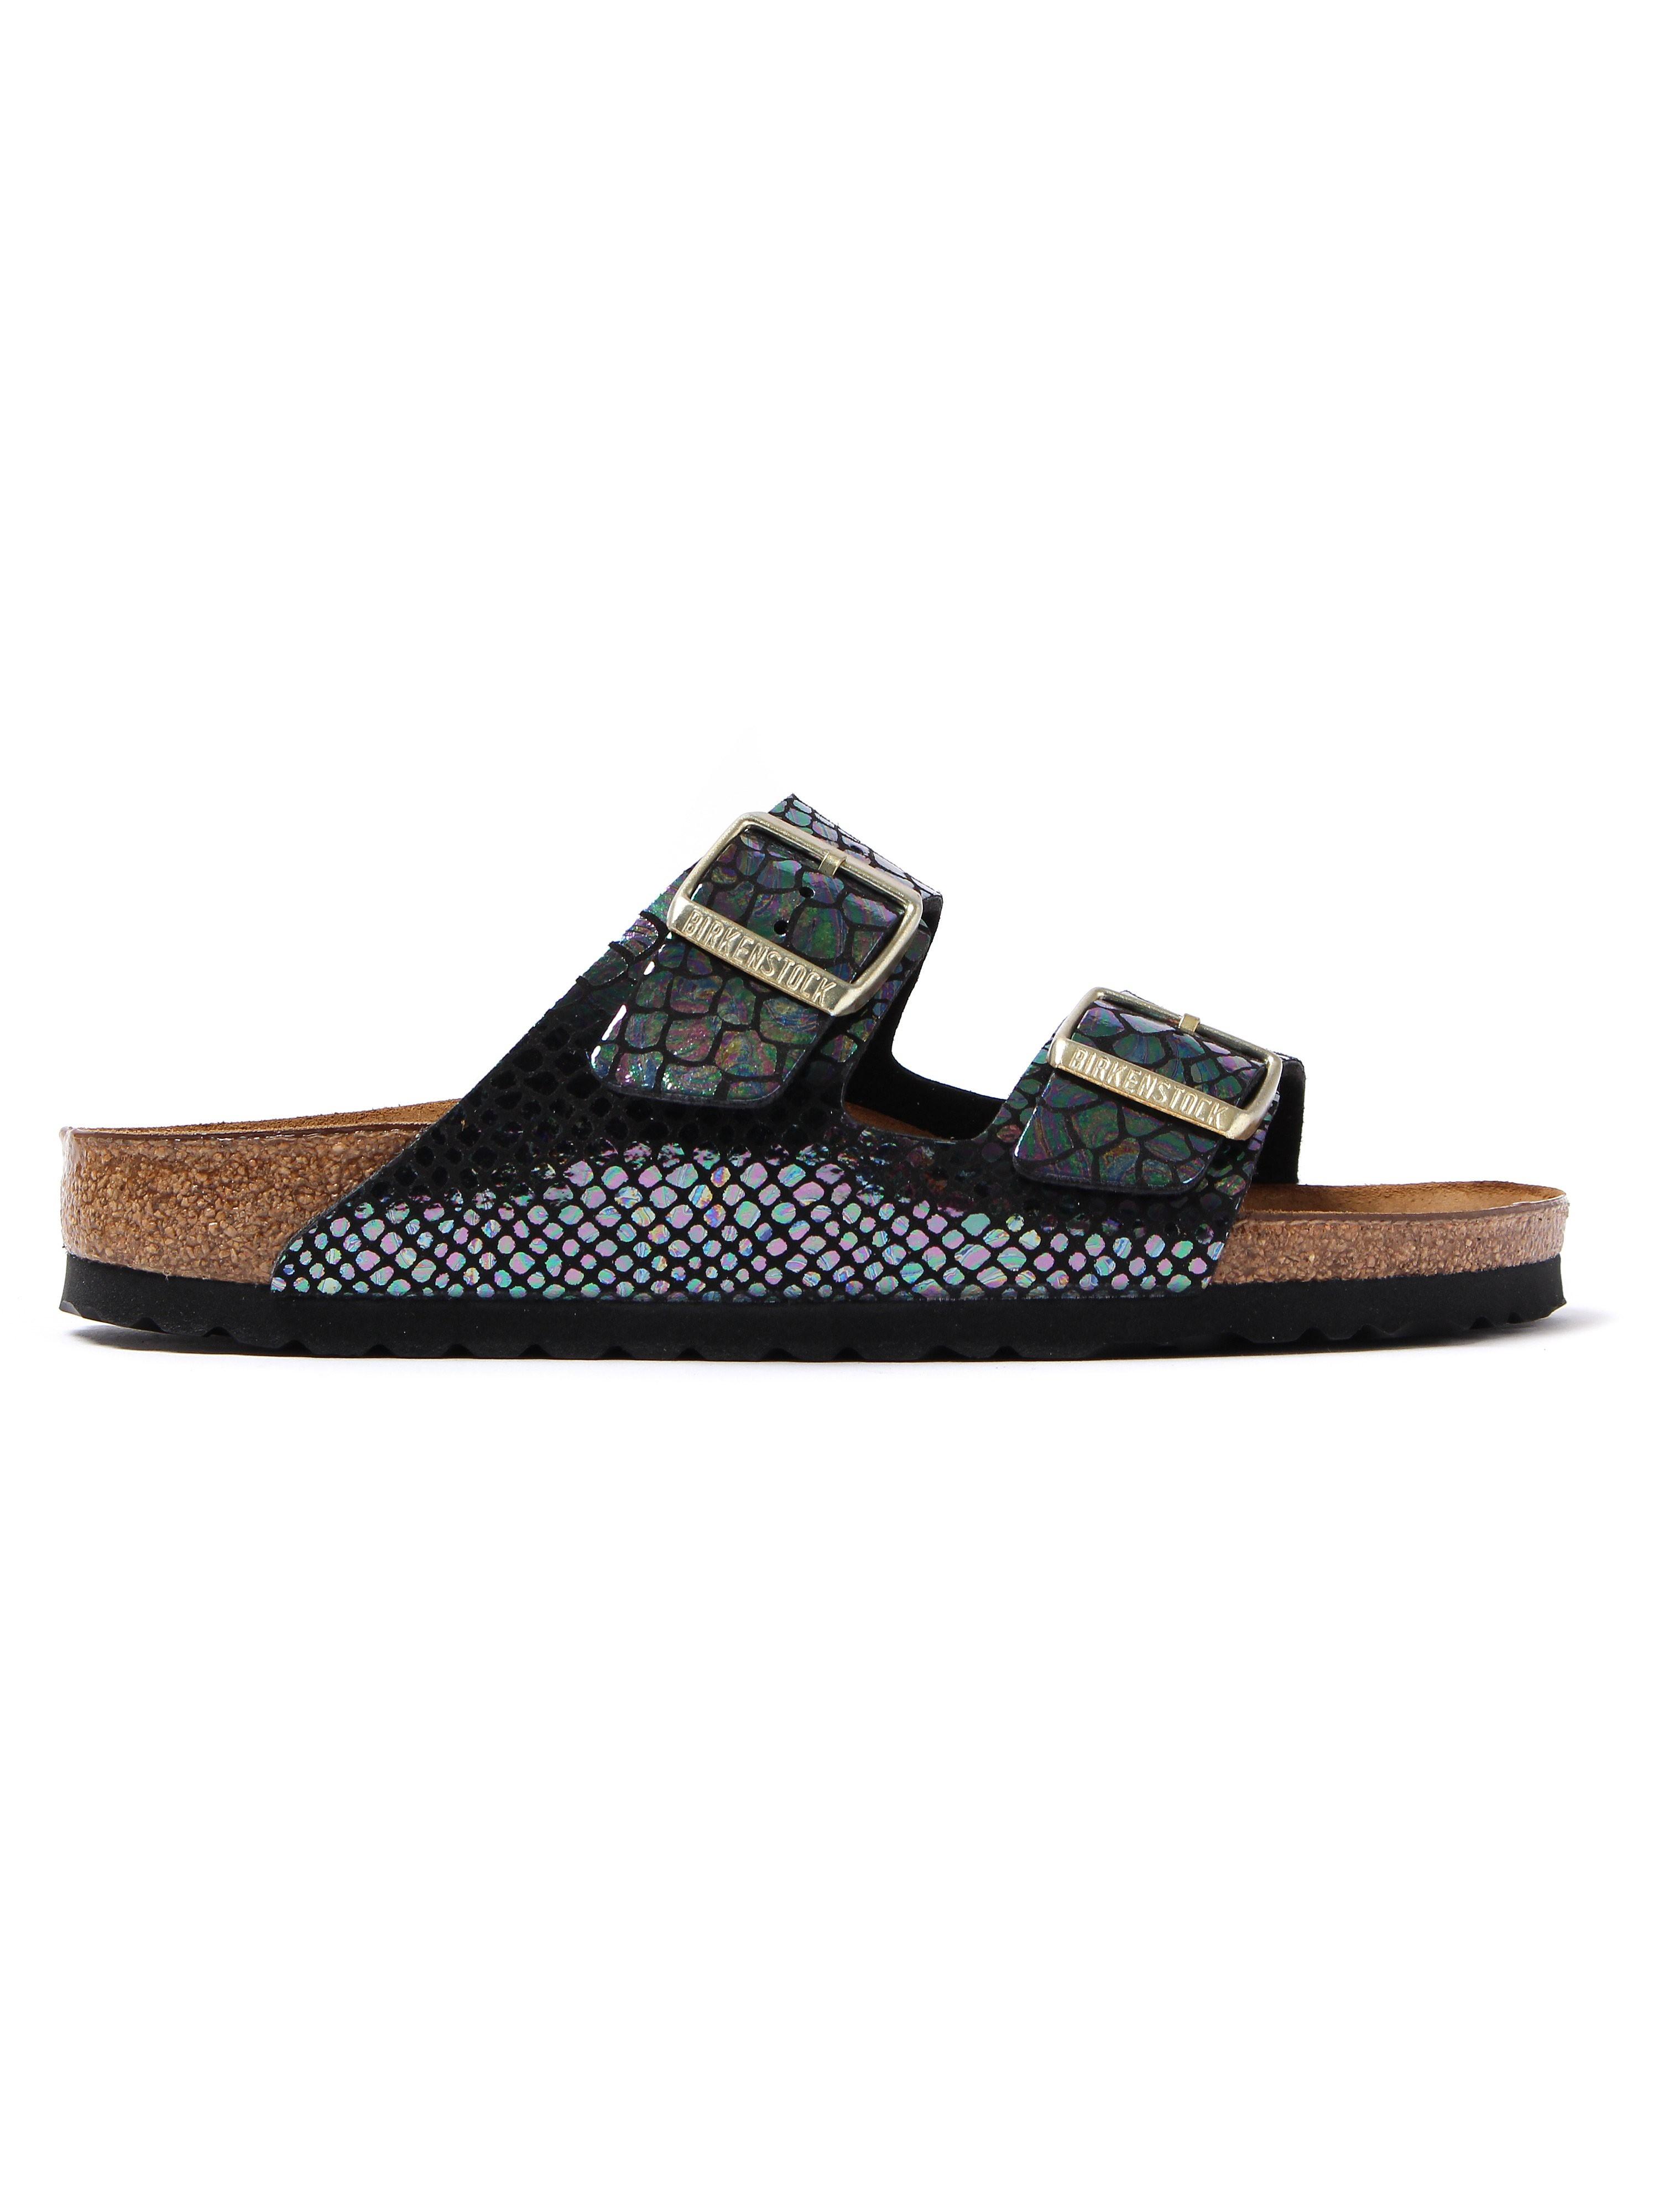 Birkenstock Women's Arizona Narrow Fit Sandals - Multicolour Snakeskin